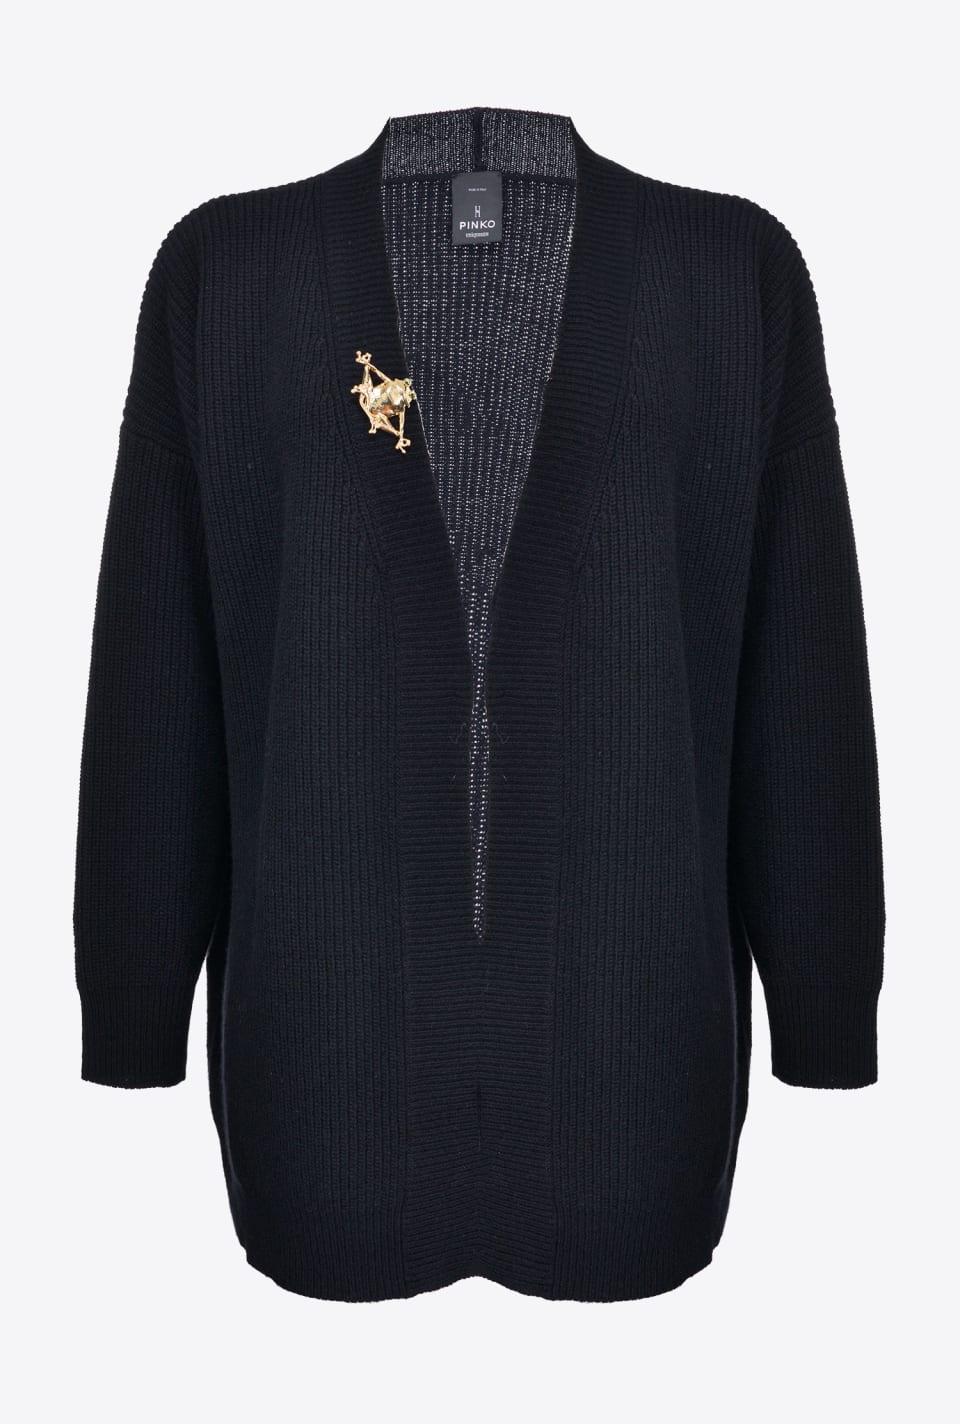 Rib knit cardigan with frog brooch - Pinko